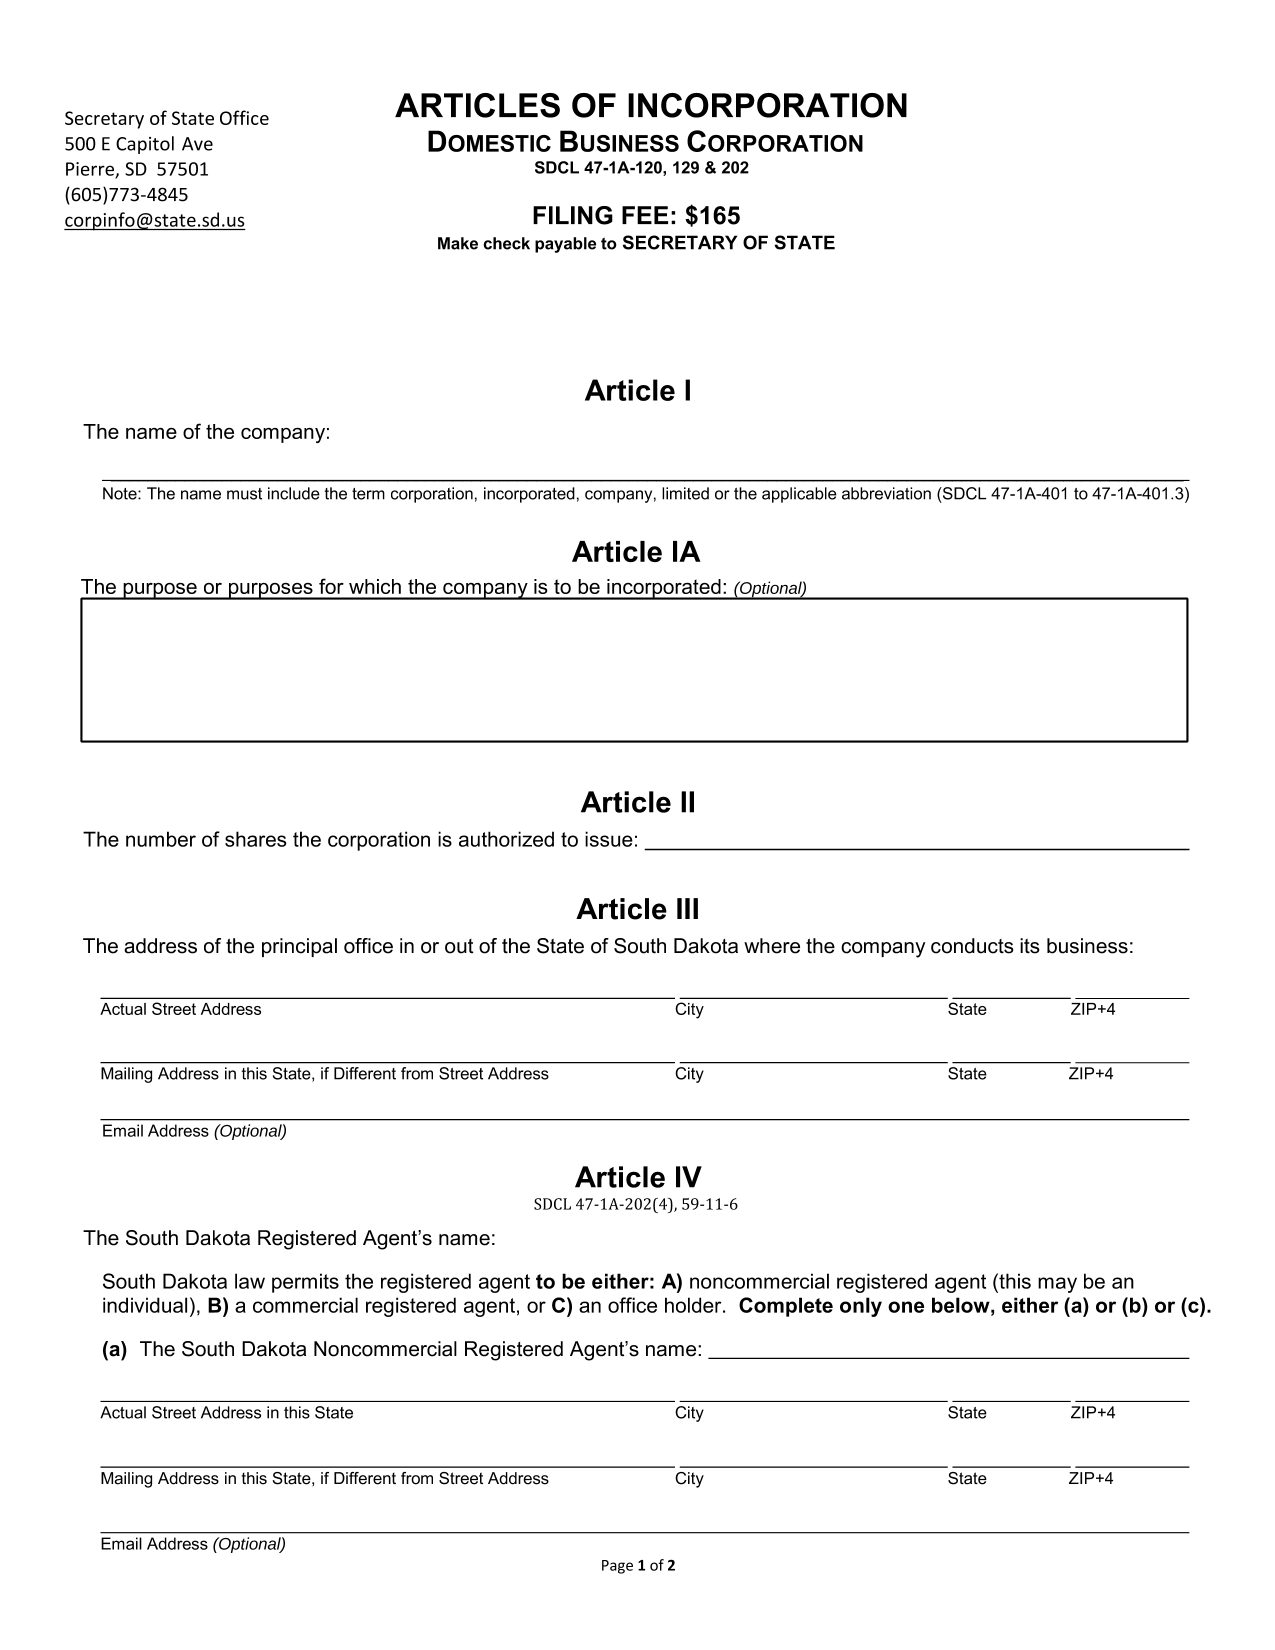 South Dakota Articles of Incorporation